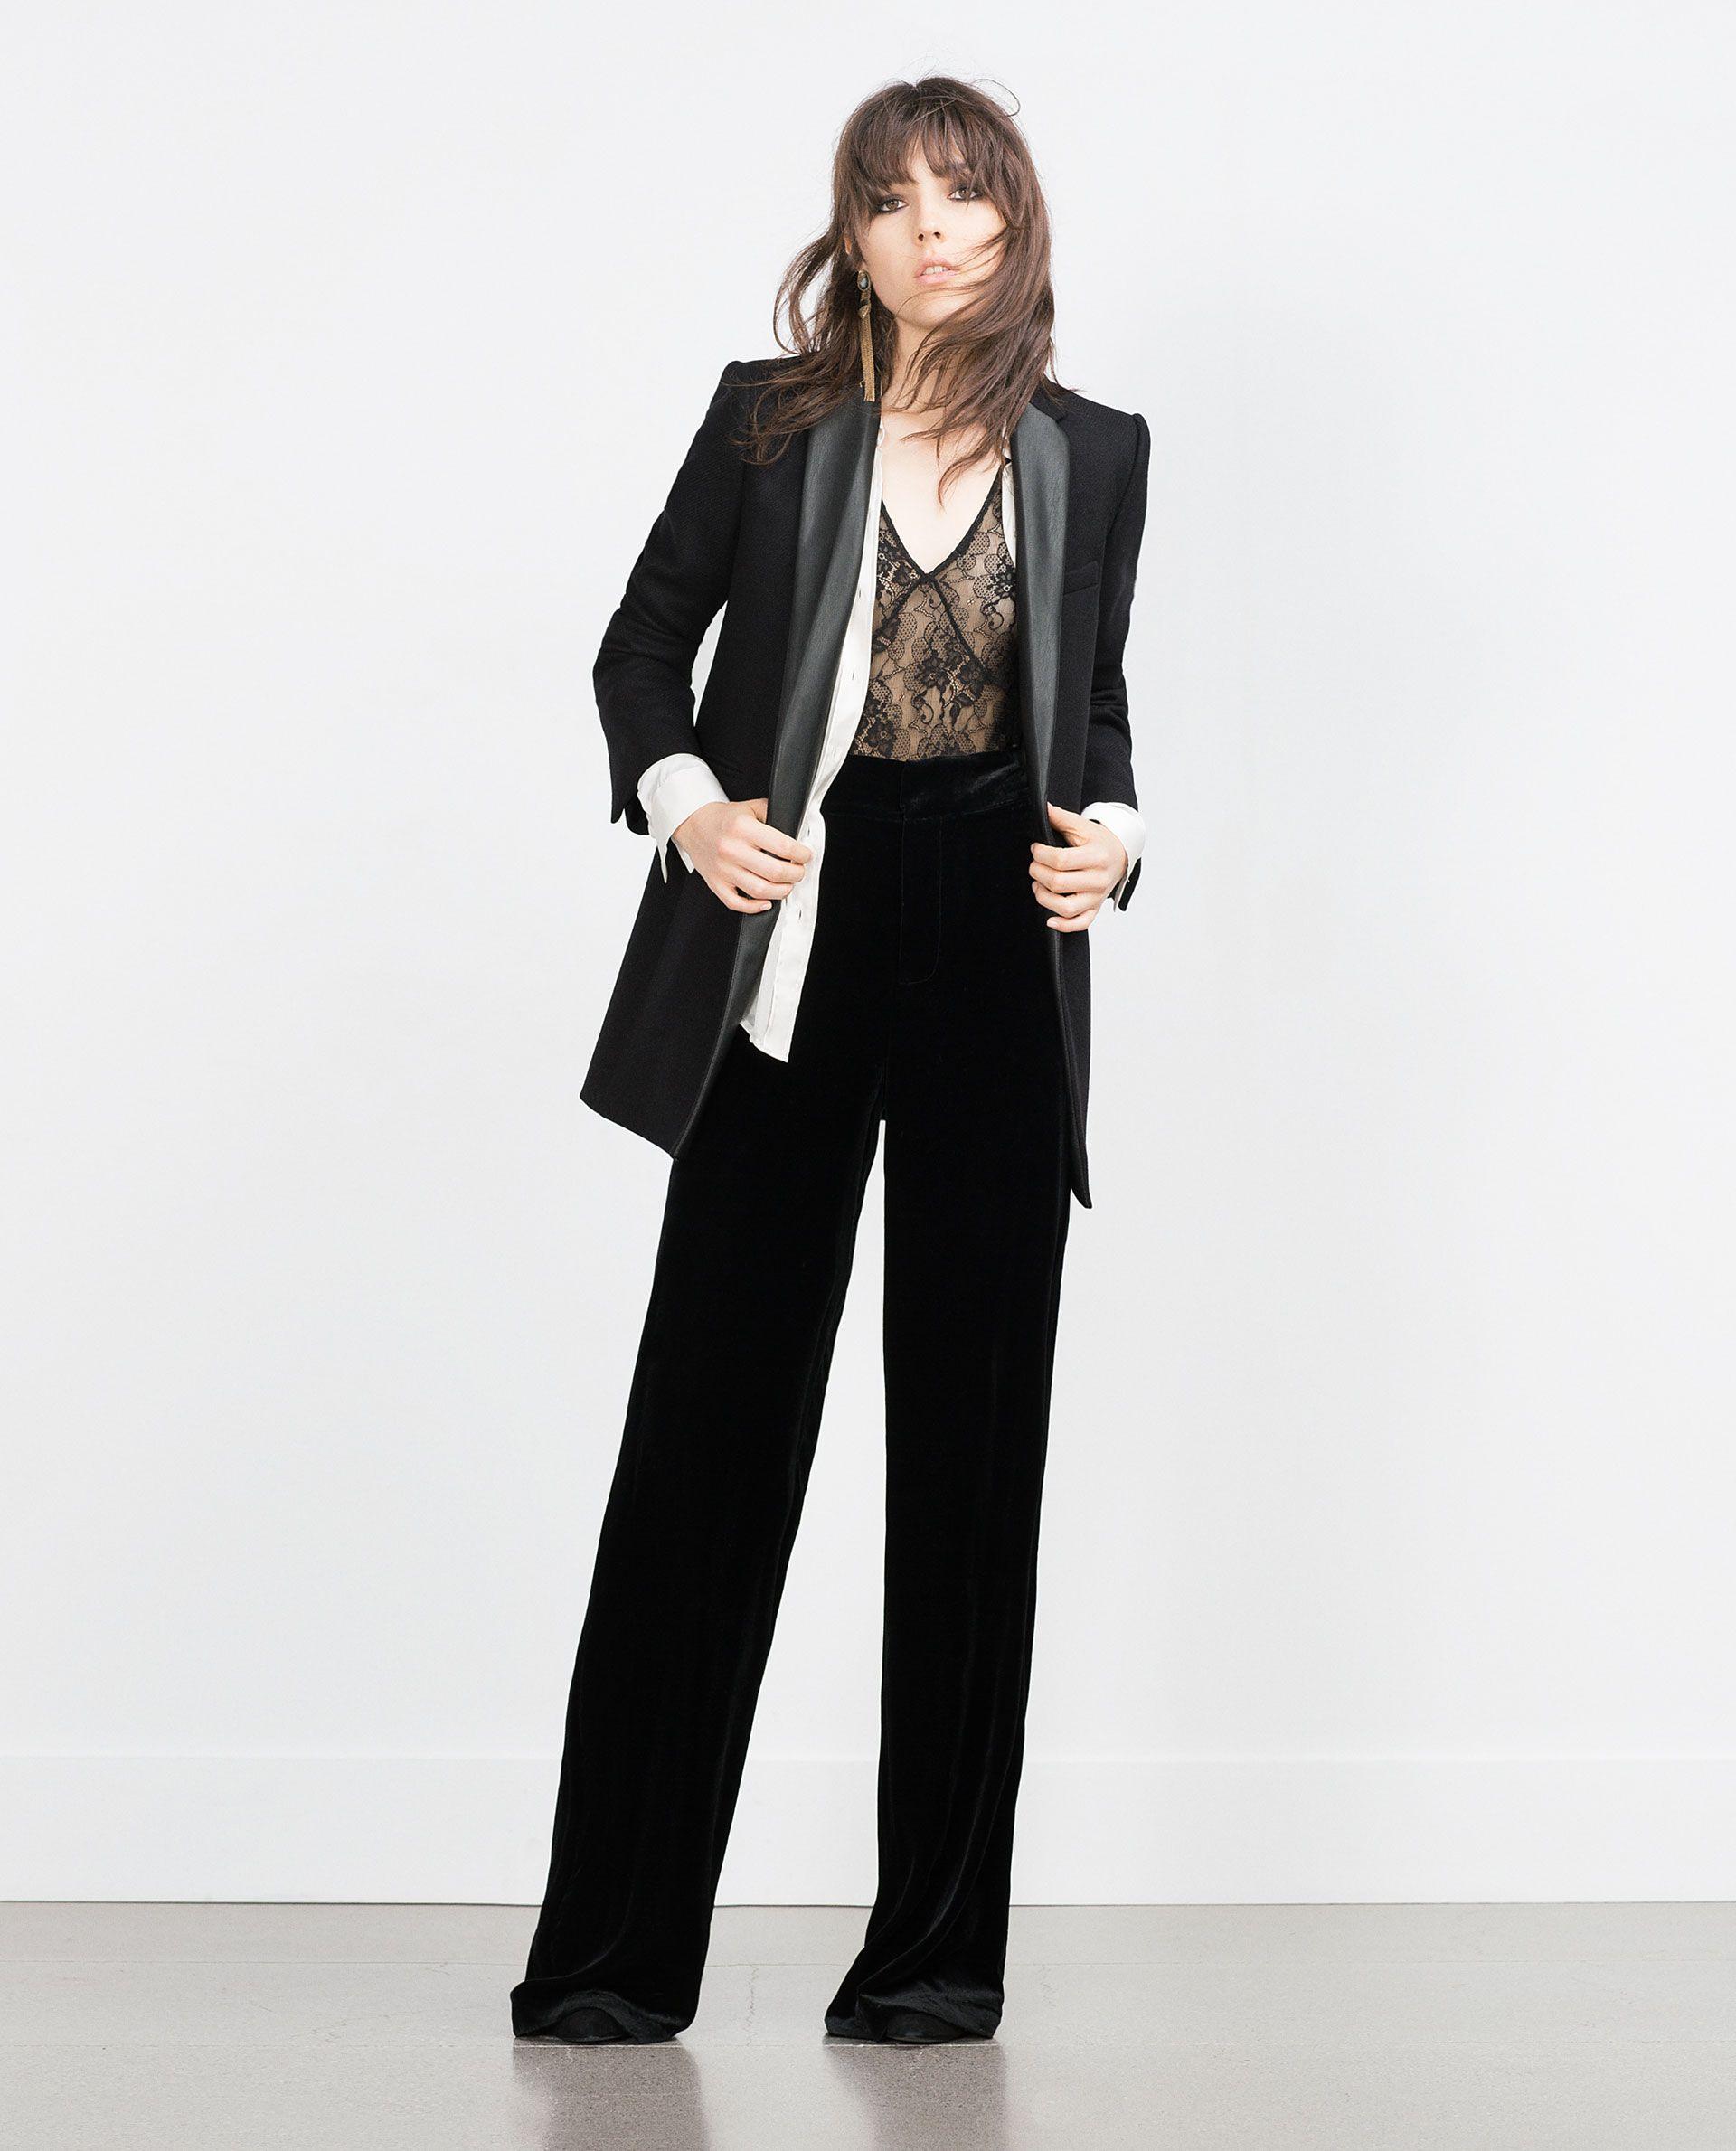 COMBINED LAPEL COAT - Jackets - WOMAN - PROMOCIJA | ZARA Romania